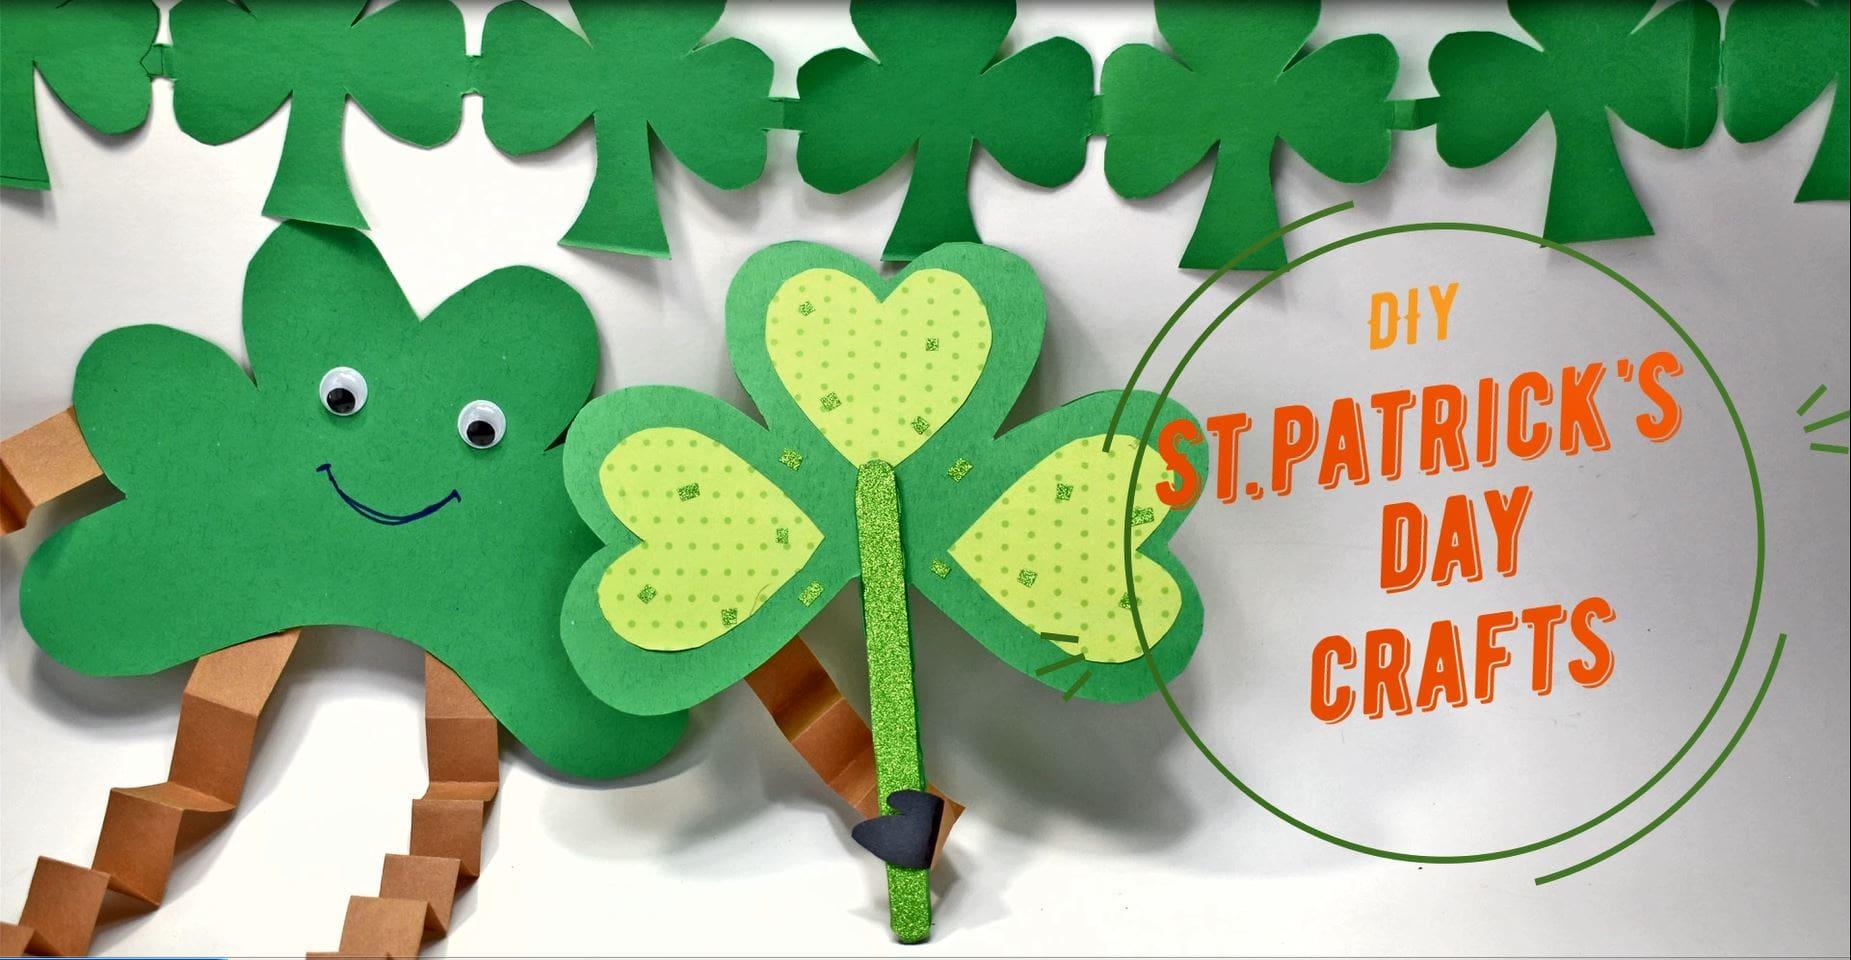 Shamrock crafts for ST.Patrick's Day